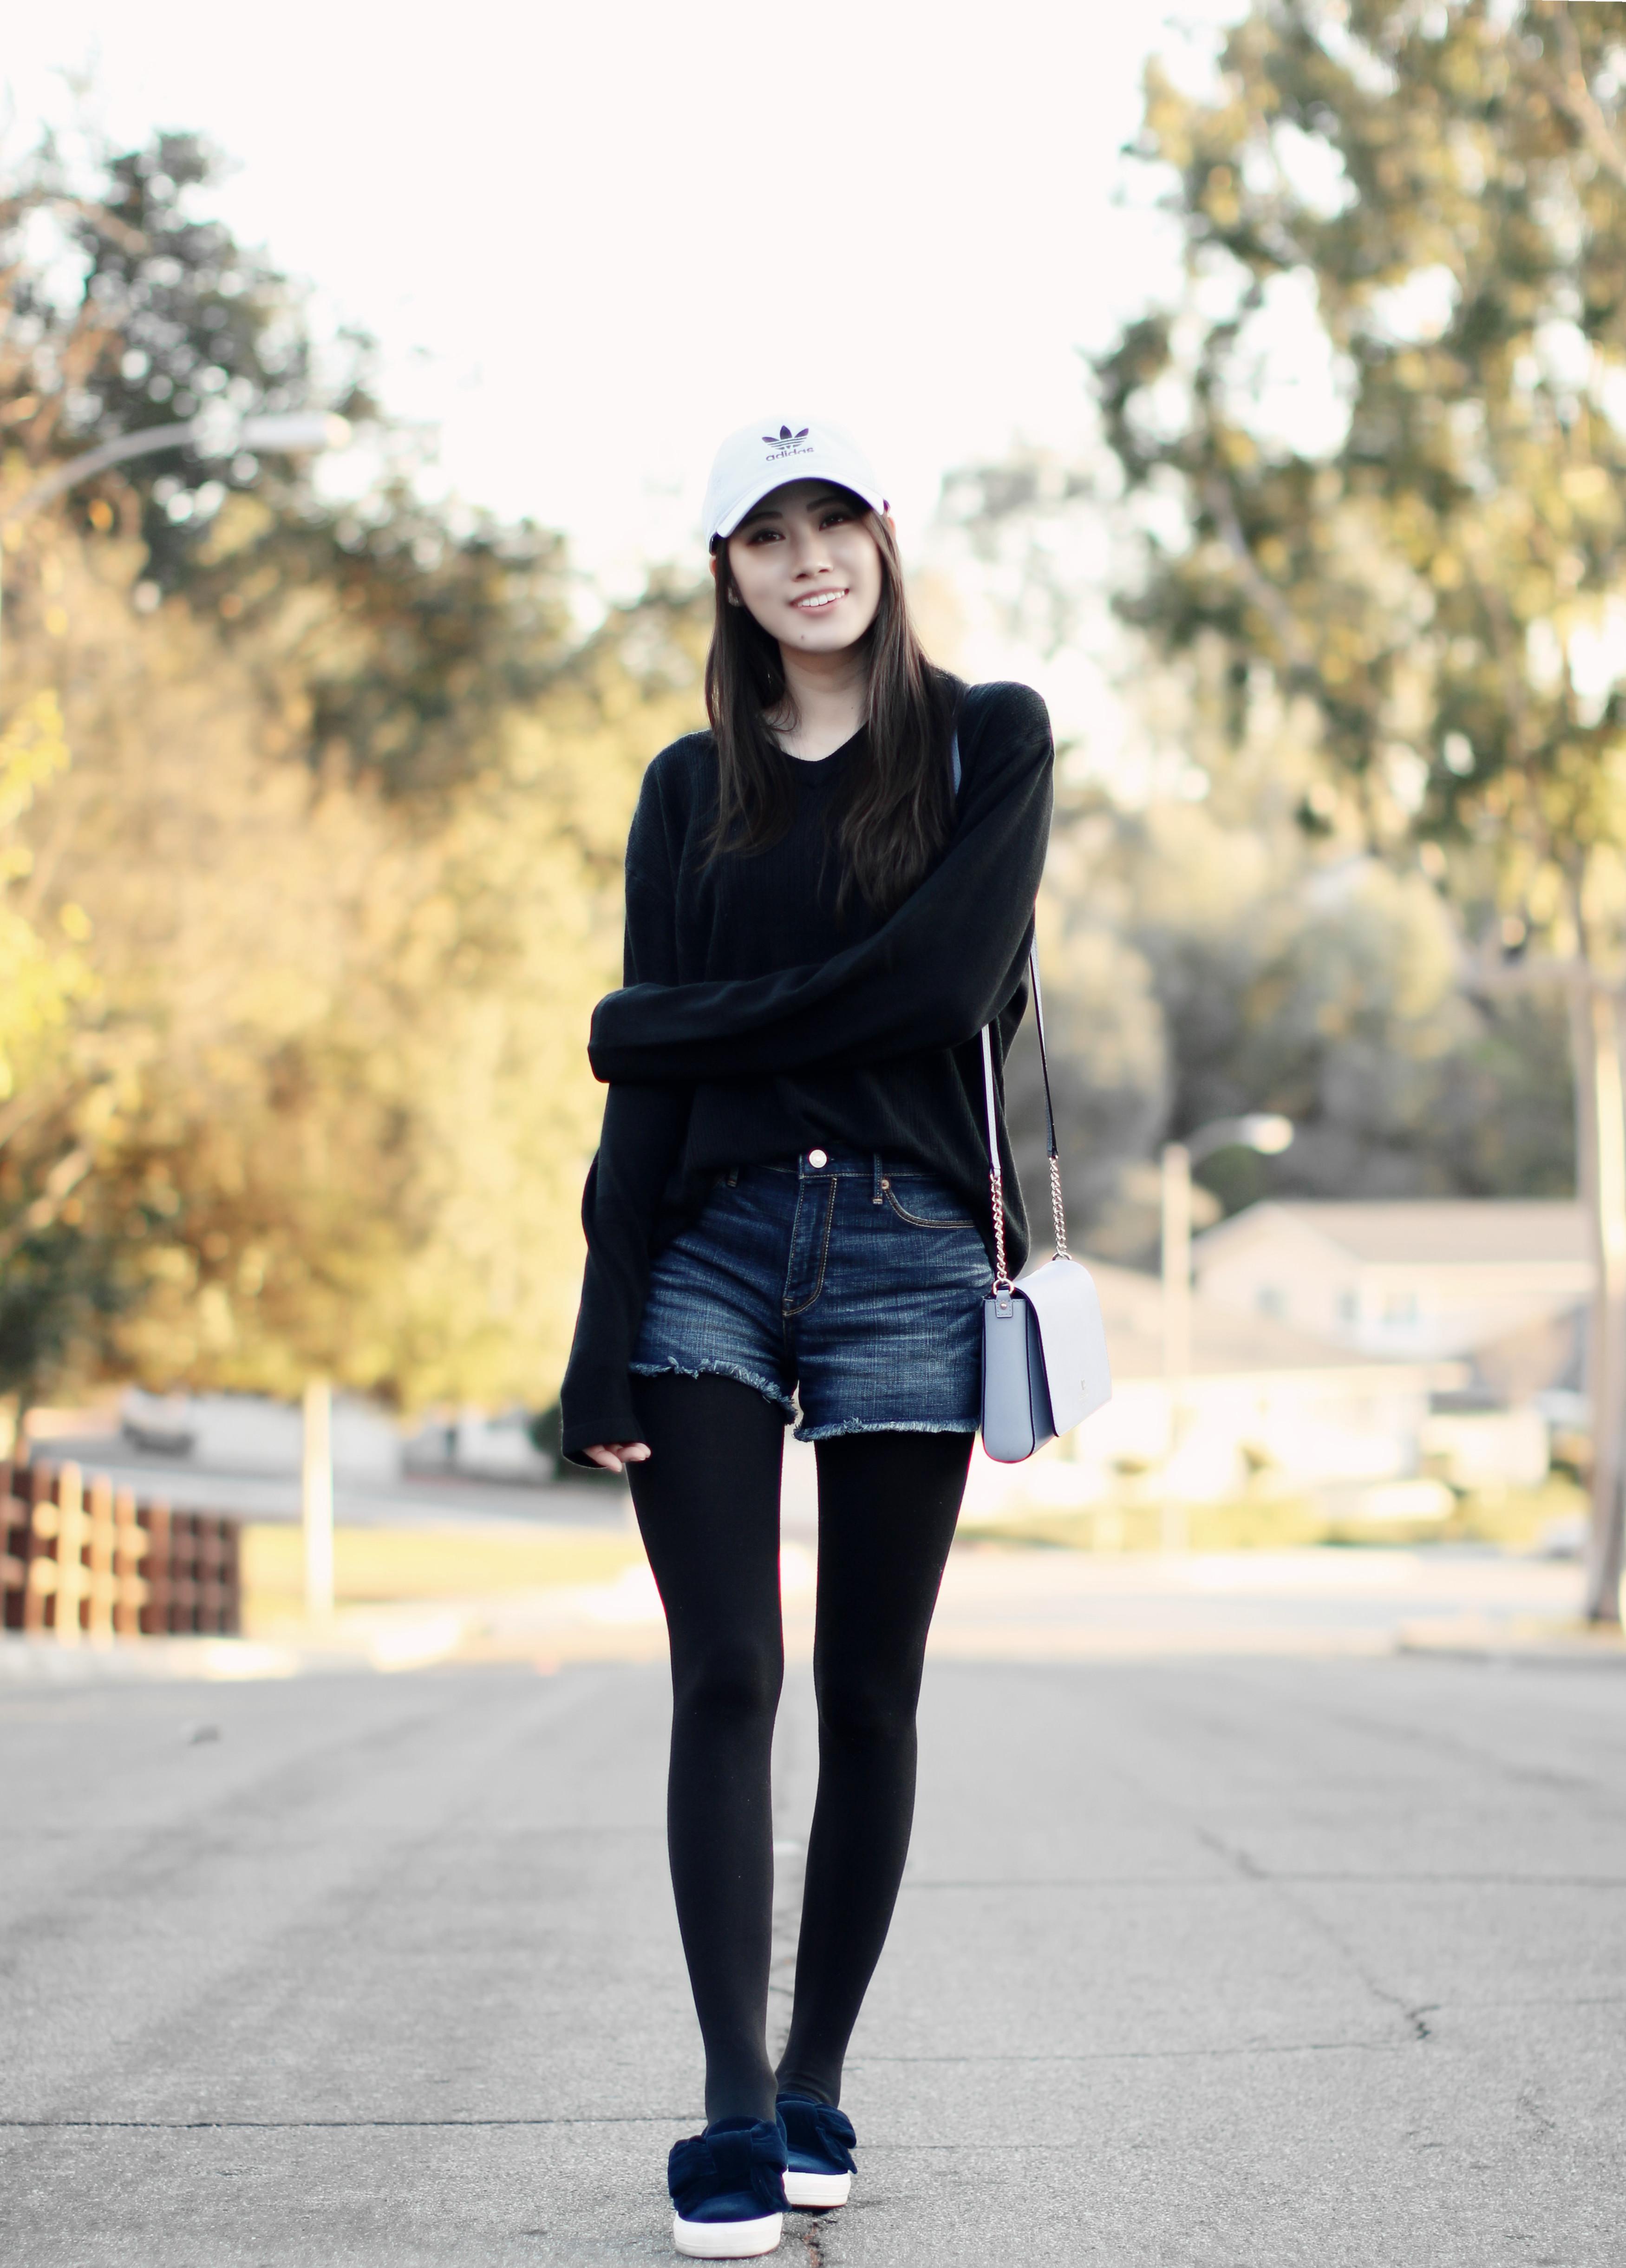 4349-ootd-fashion-style-outfitoftheday-wiwt-streetstyle-adidas-urbanoutfitters-hm-f21xme-nike-elizabeeetht-clothestoyouuu